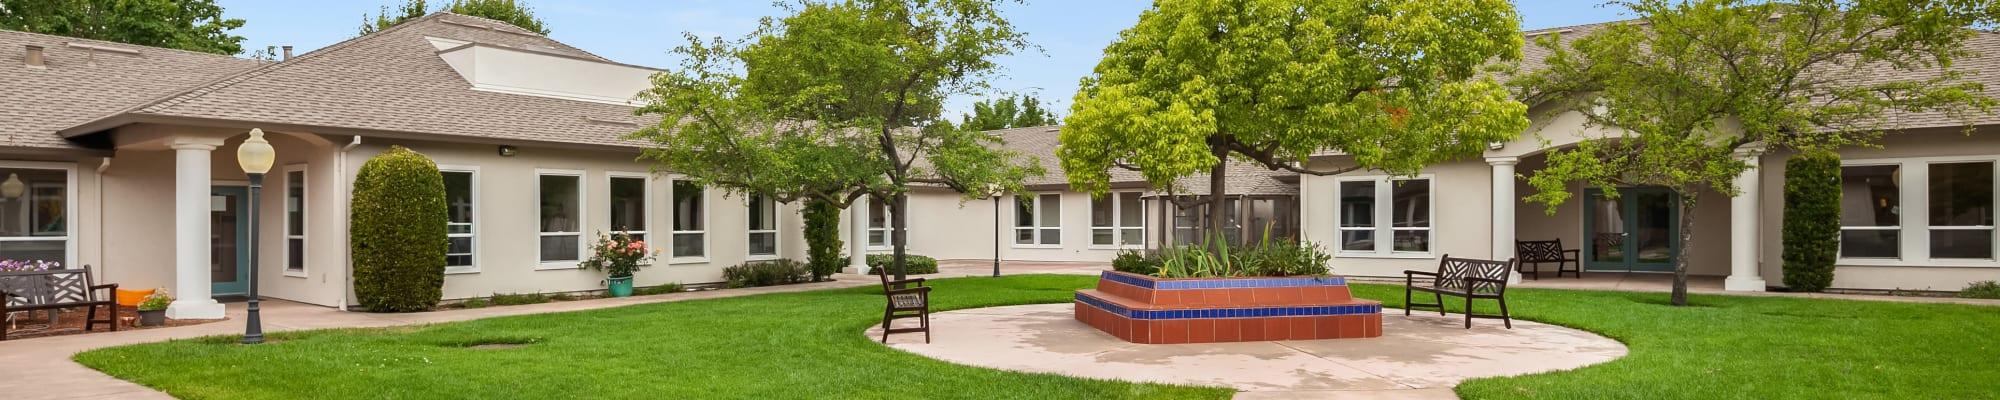 Our community at MuirWoods Memory Care in Petaluma, California